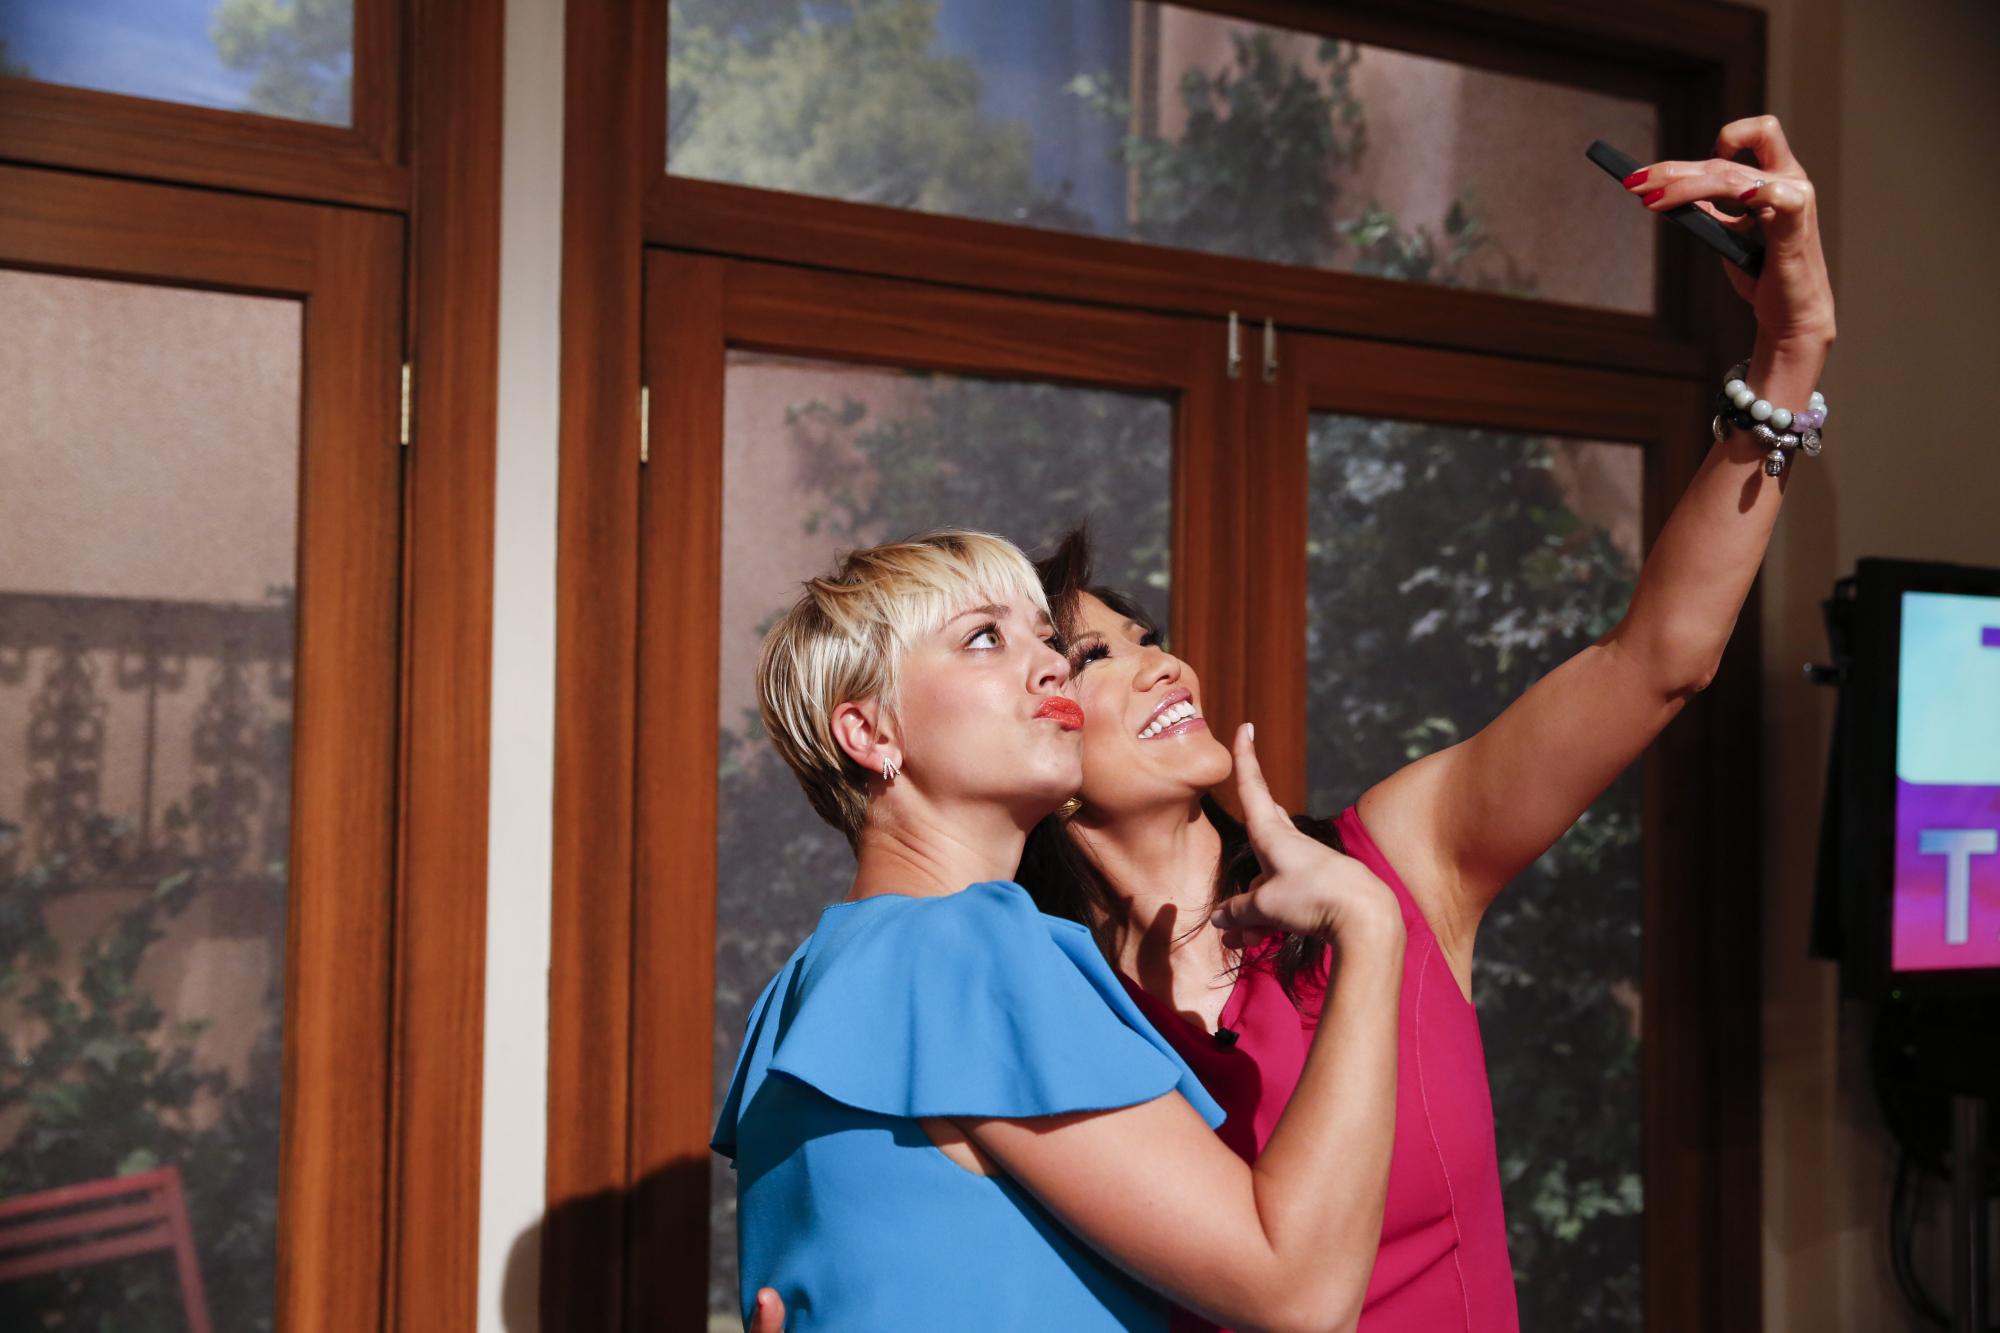 7. Julie taking selfies with Kaley Cuoco-Sweeting.